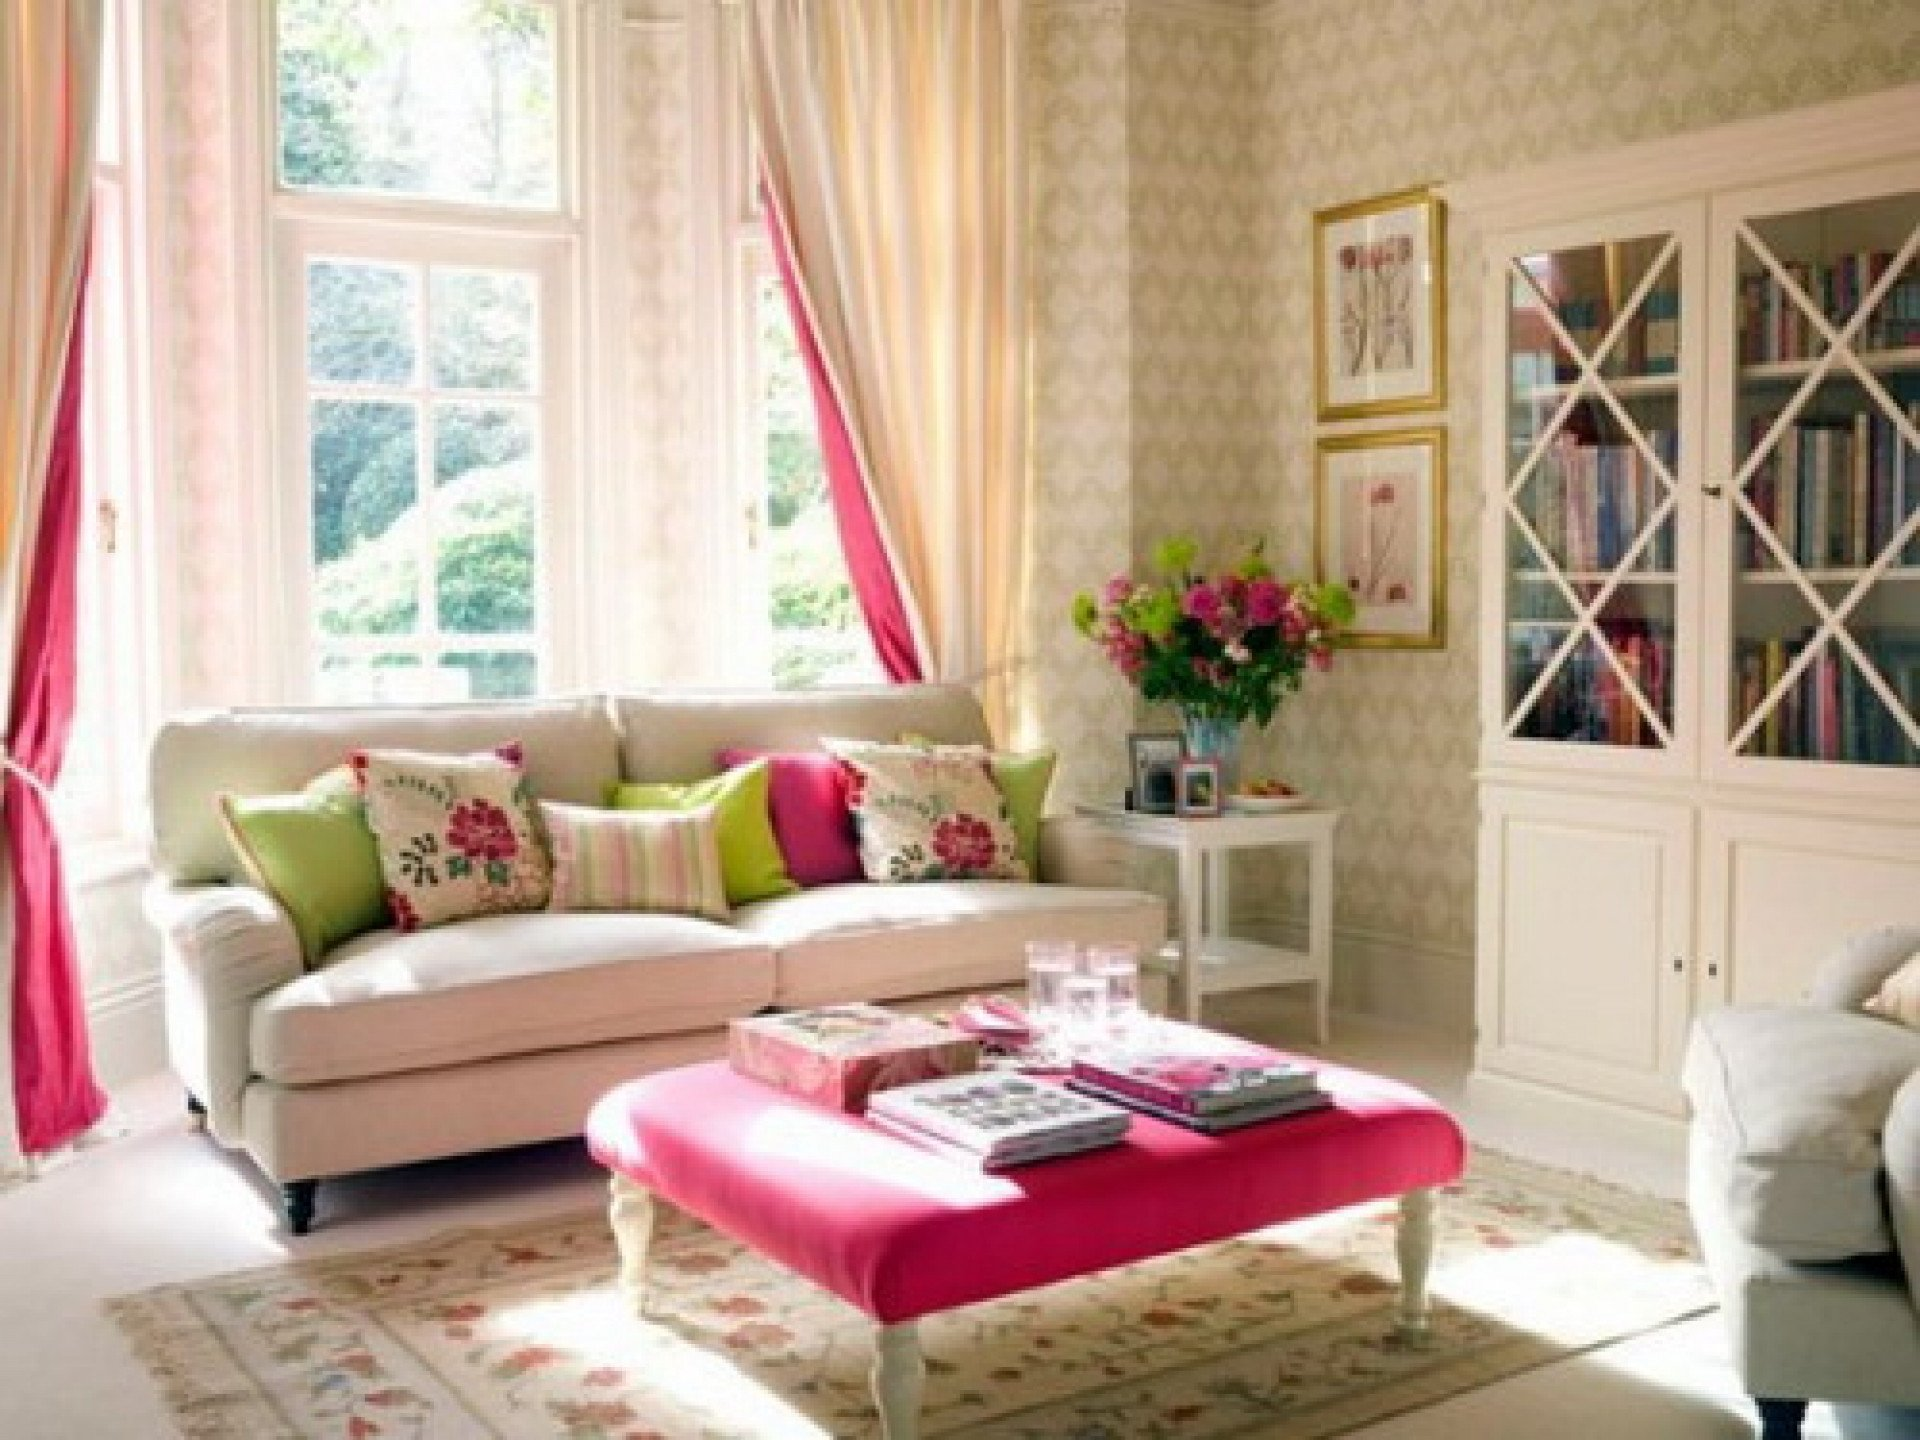 Comfortable Feminine Living Room Romantic Living Room Ideas for Feminine Young La S' Casa